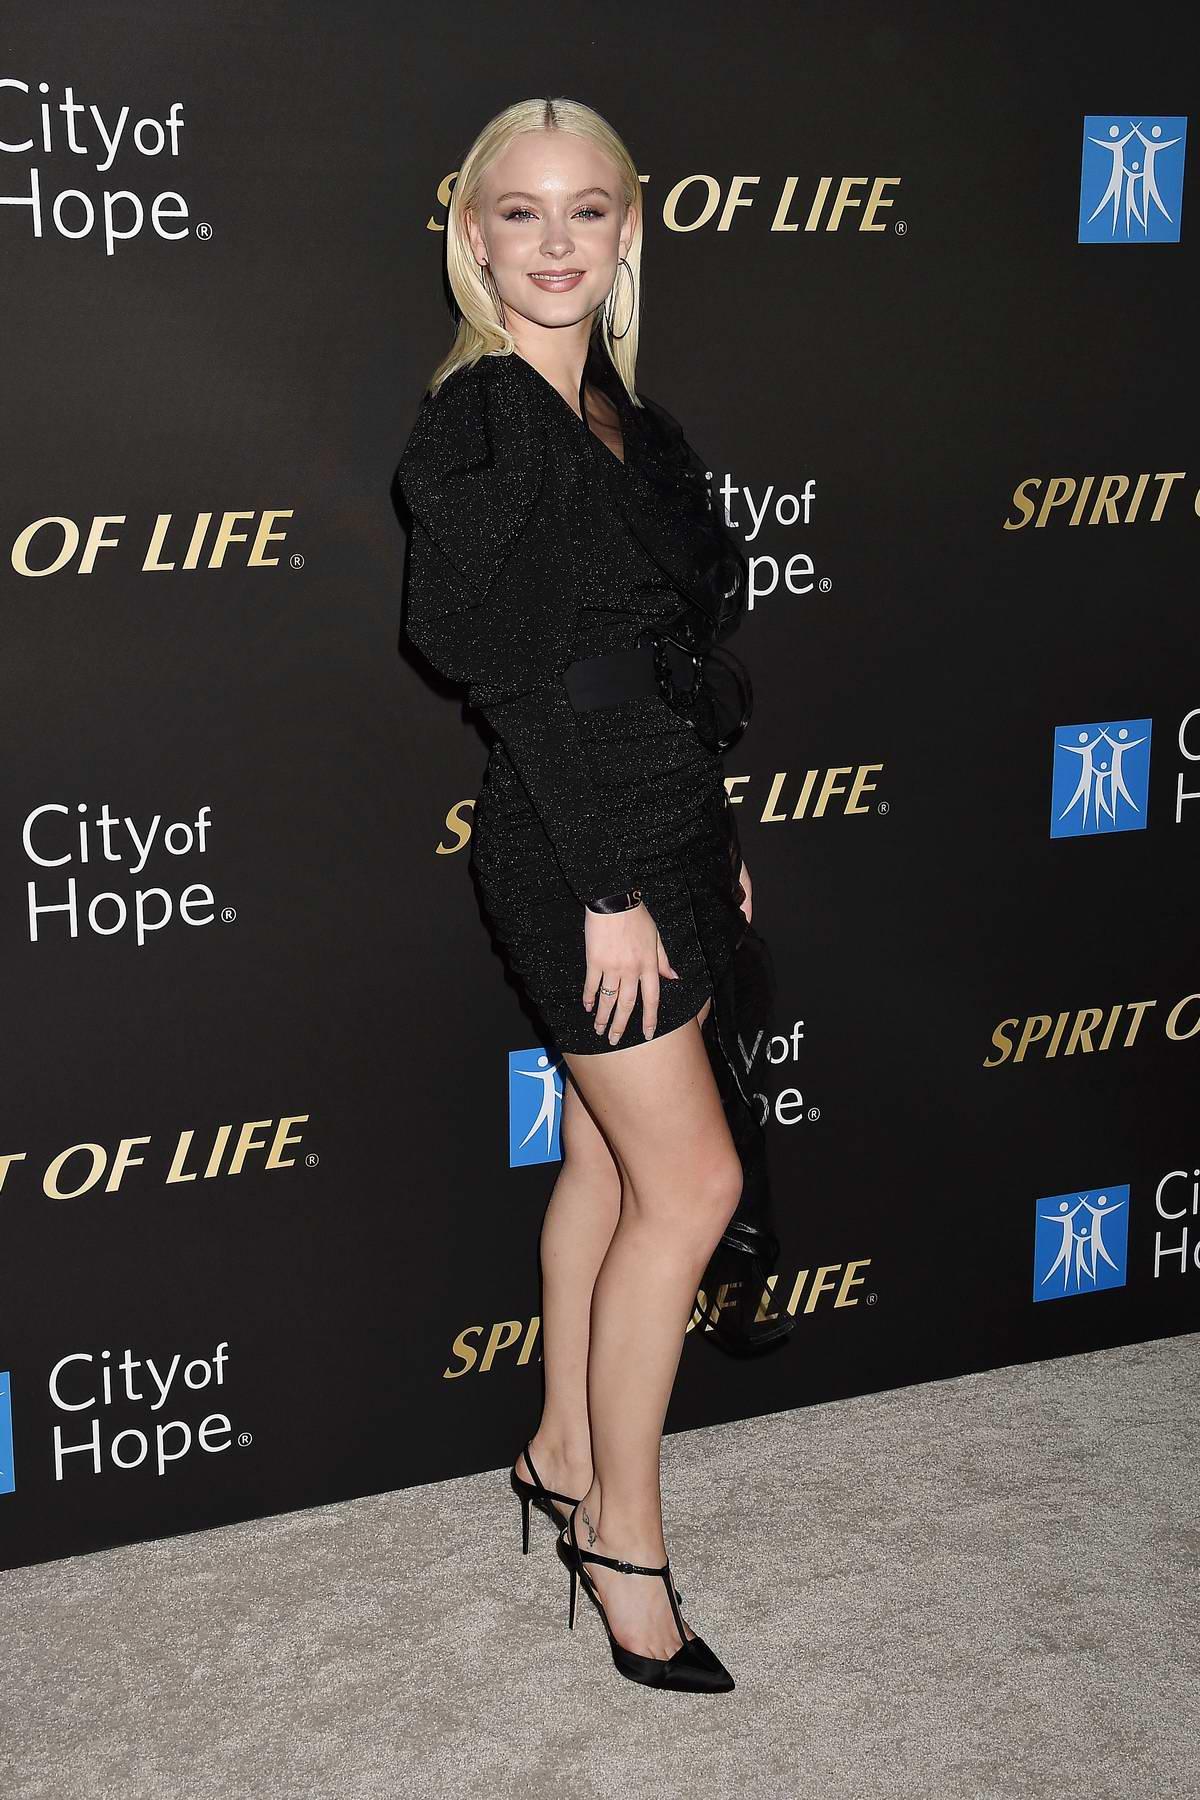 Zara Larsson attends the City Of Hope Spirit Of Life Gala 2019 in Santa Monica, California